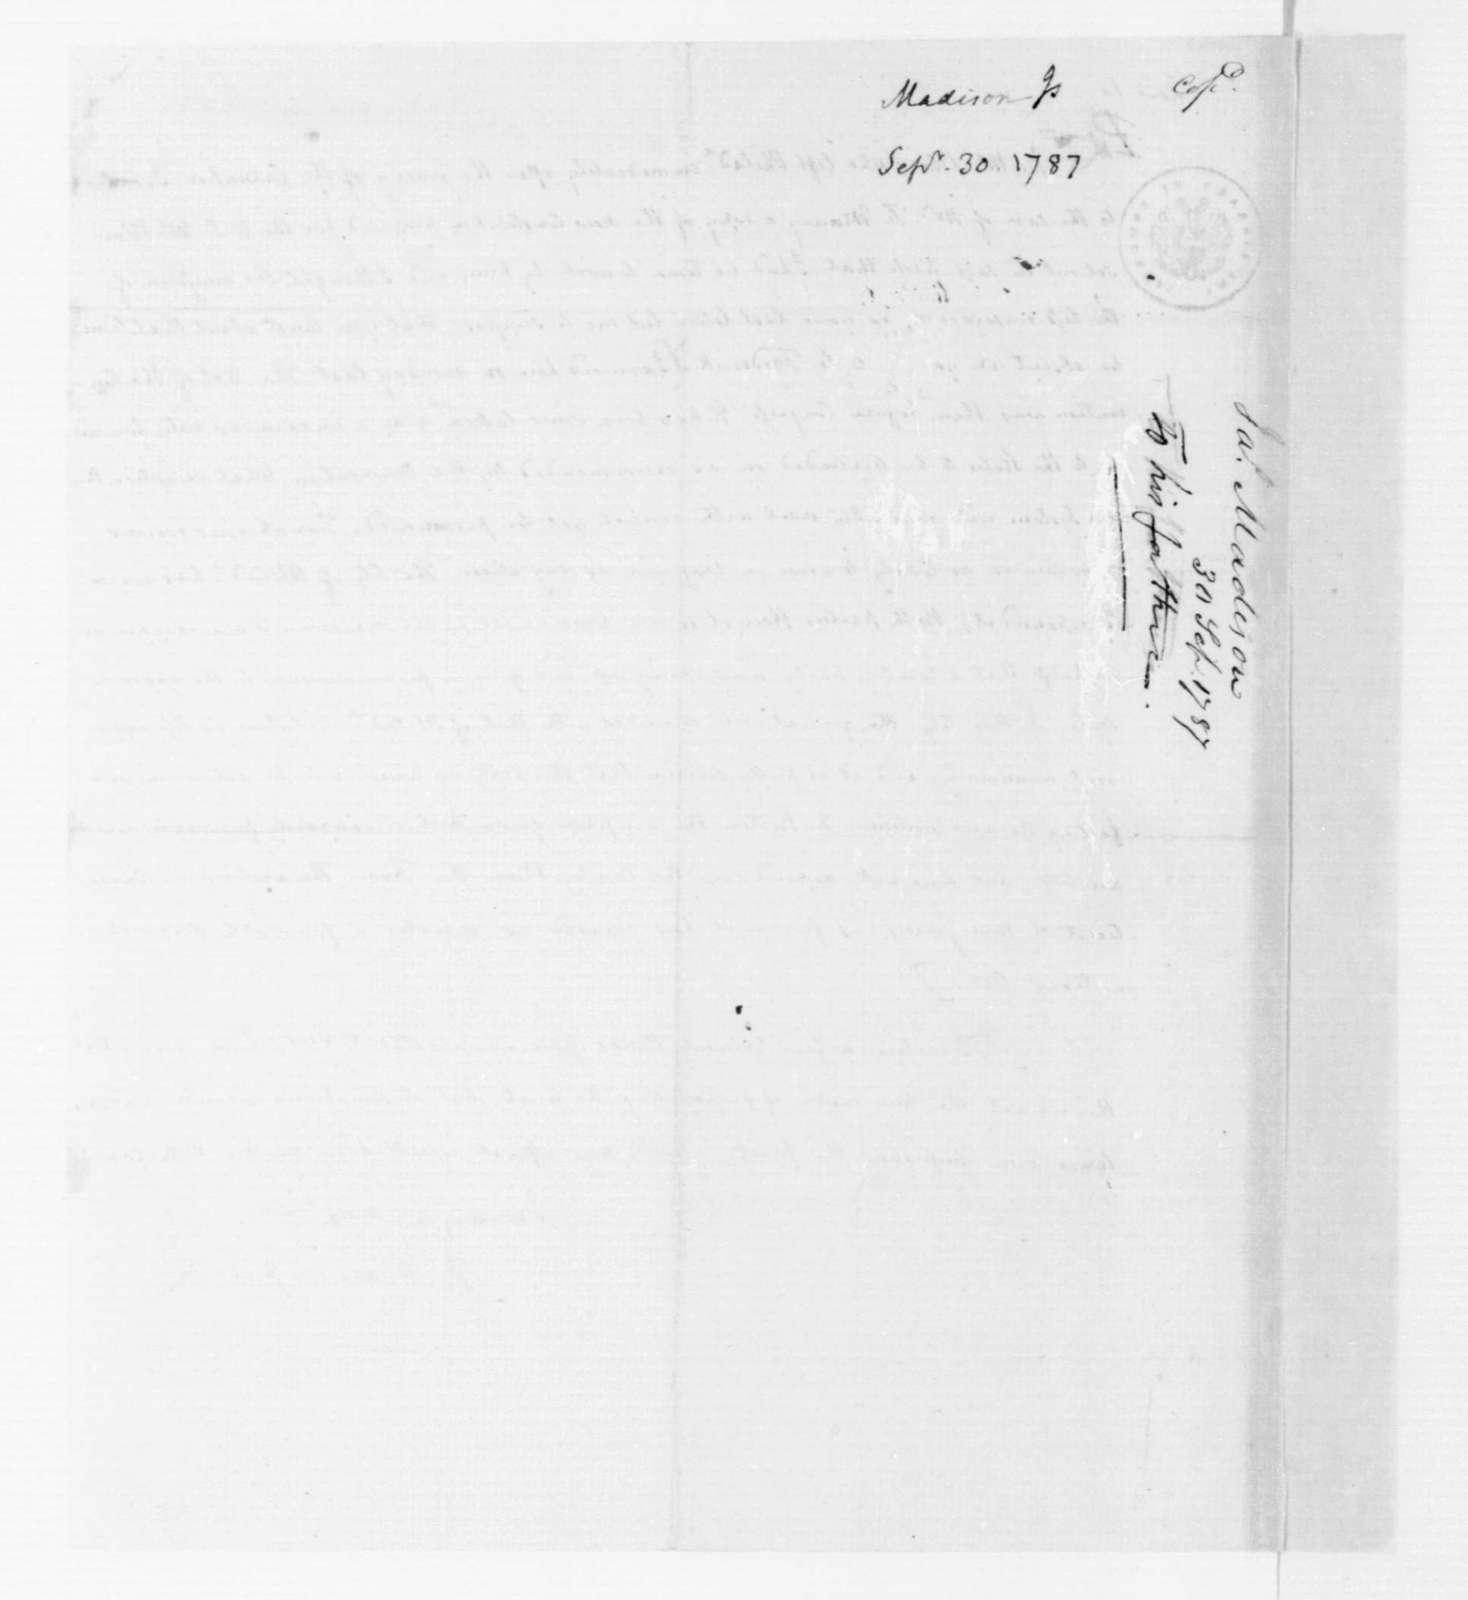 James Madison to James Madison Sr., September 30, 1787.